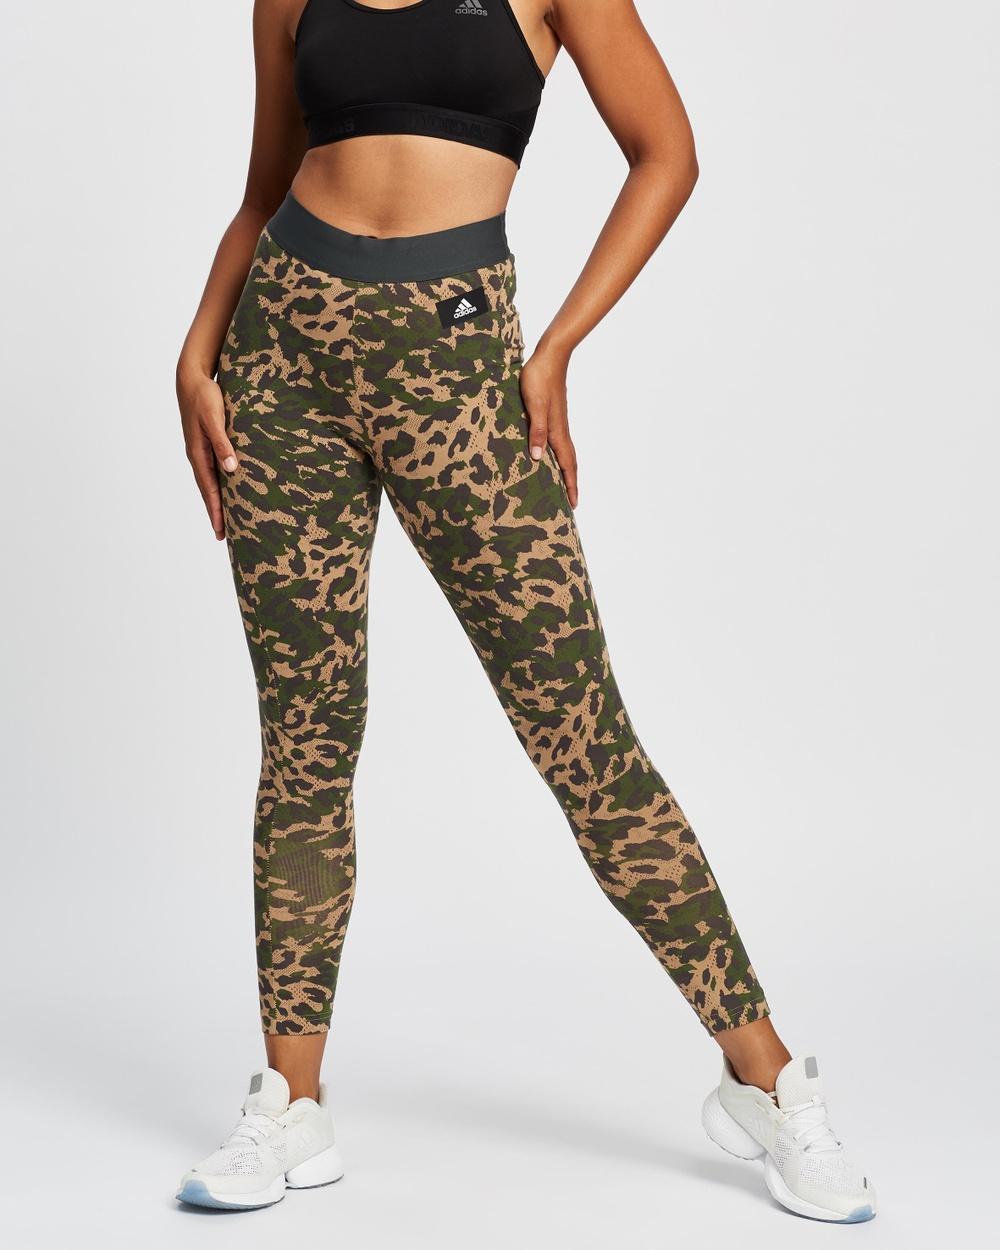 adidas Performance Sportswear Leopard Print Cotton Leggings 7/8 Tights Cardboard